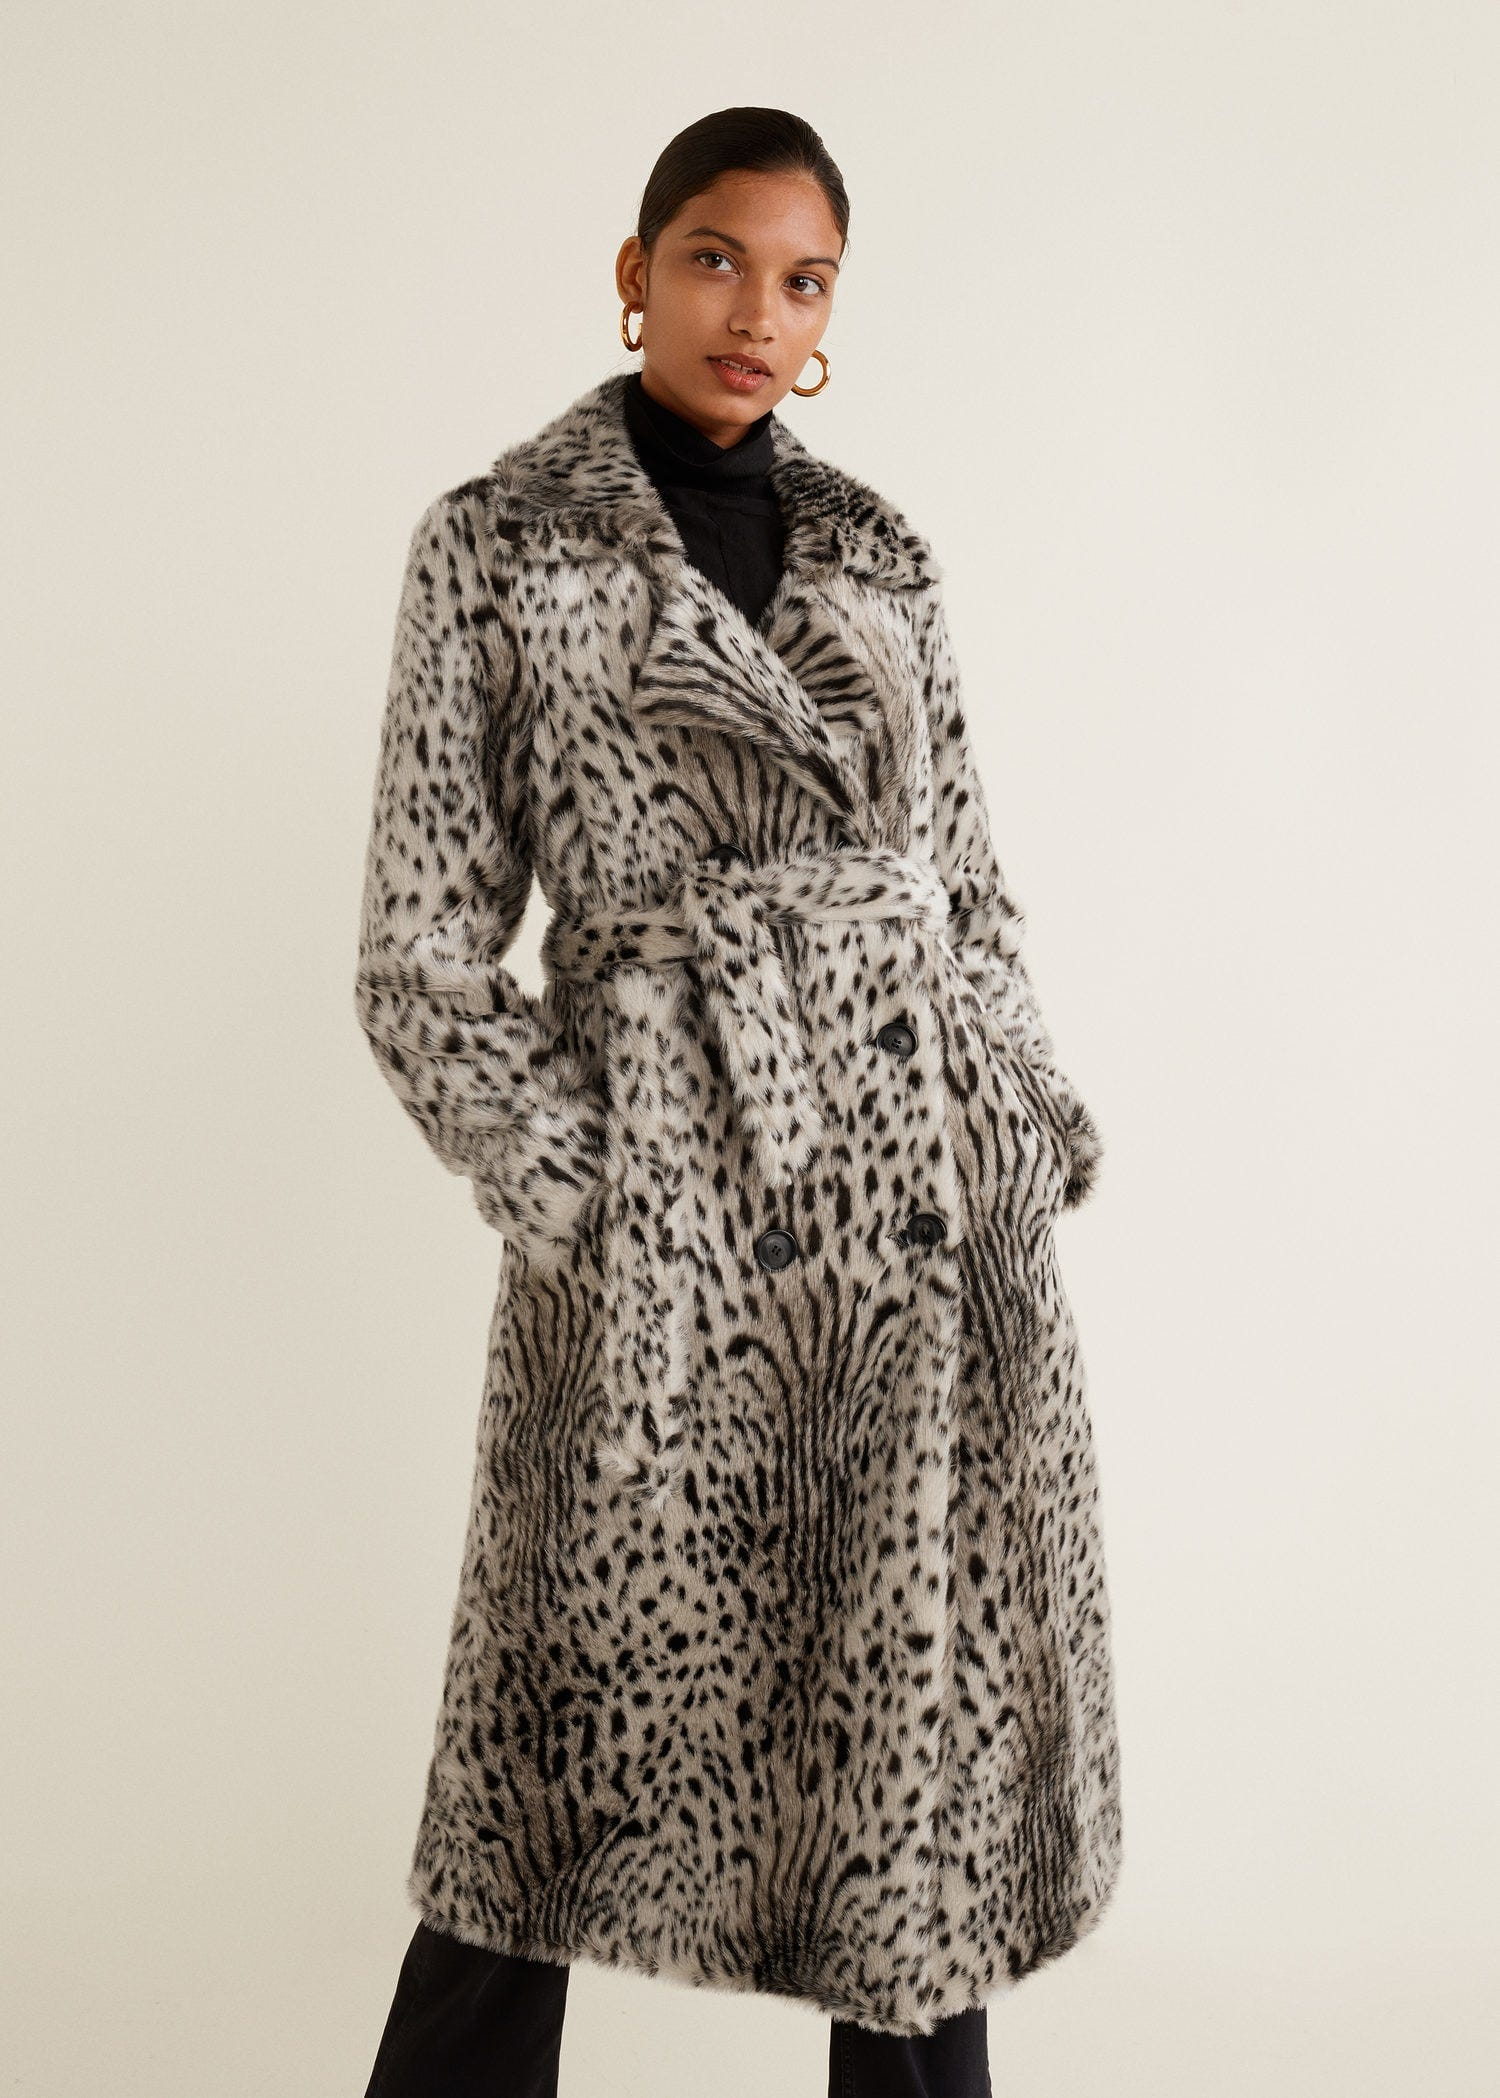 356f1f2c86 Best Leopard Print Coats To Keep You Warm Winter 2018